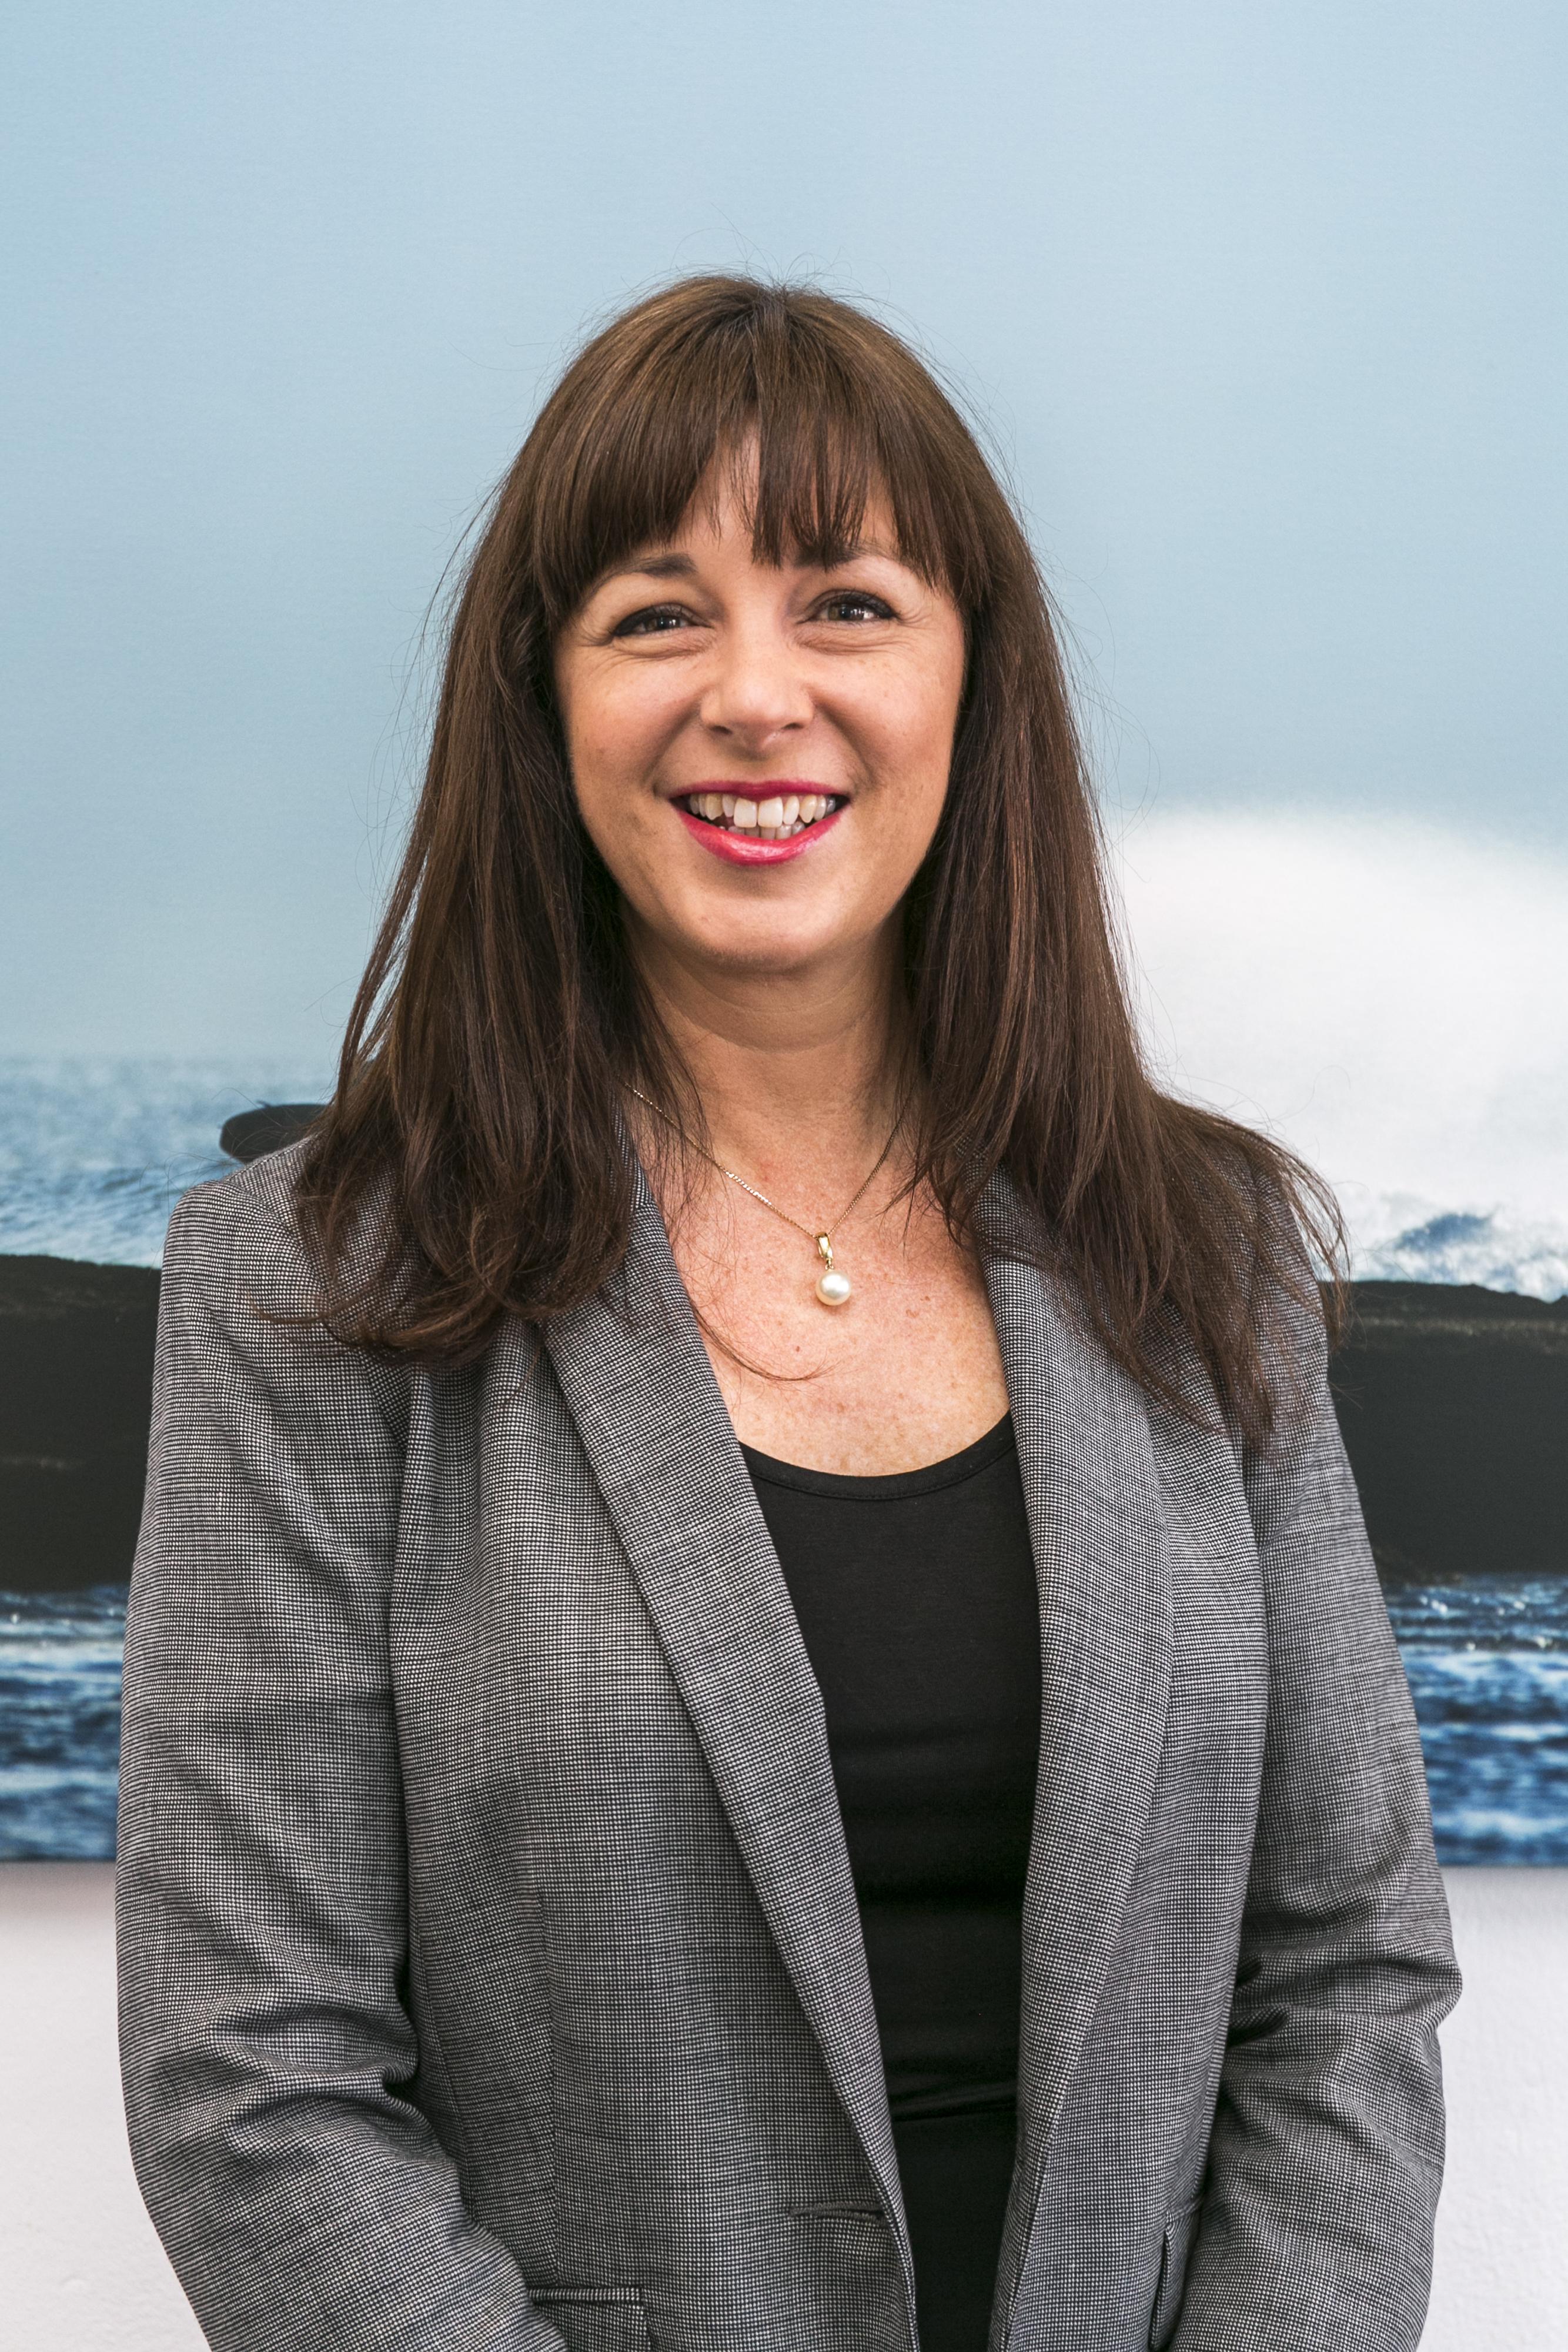 Michelle McDonald